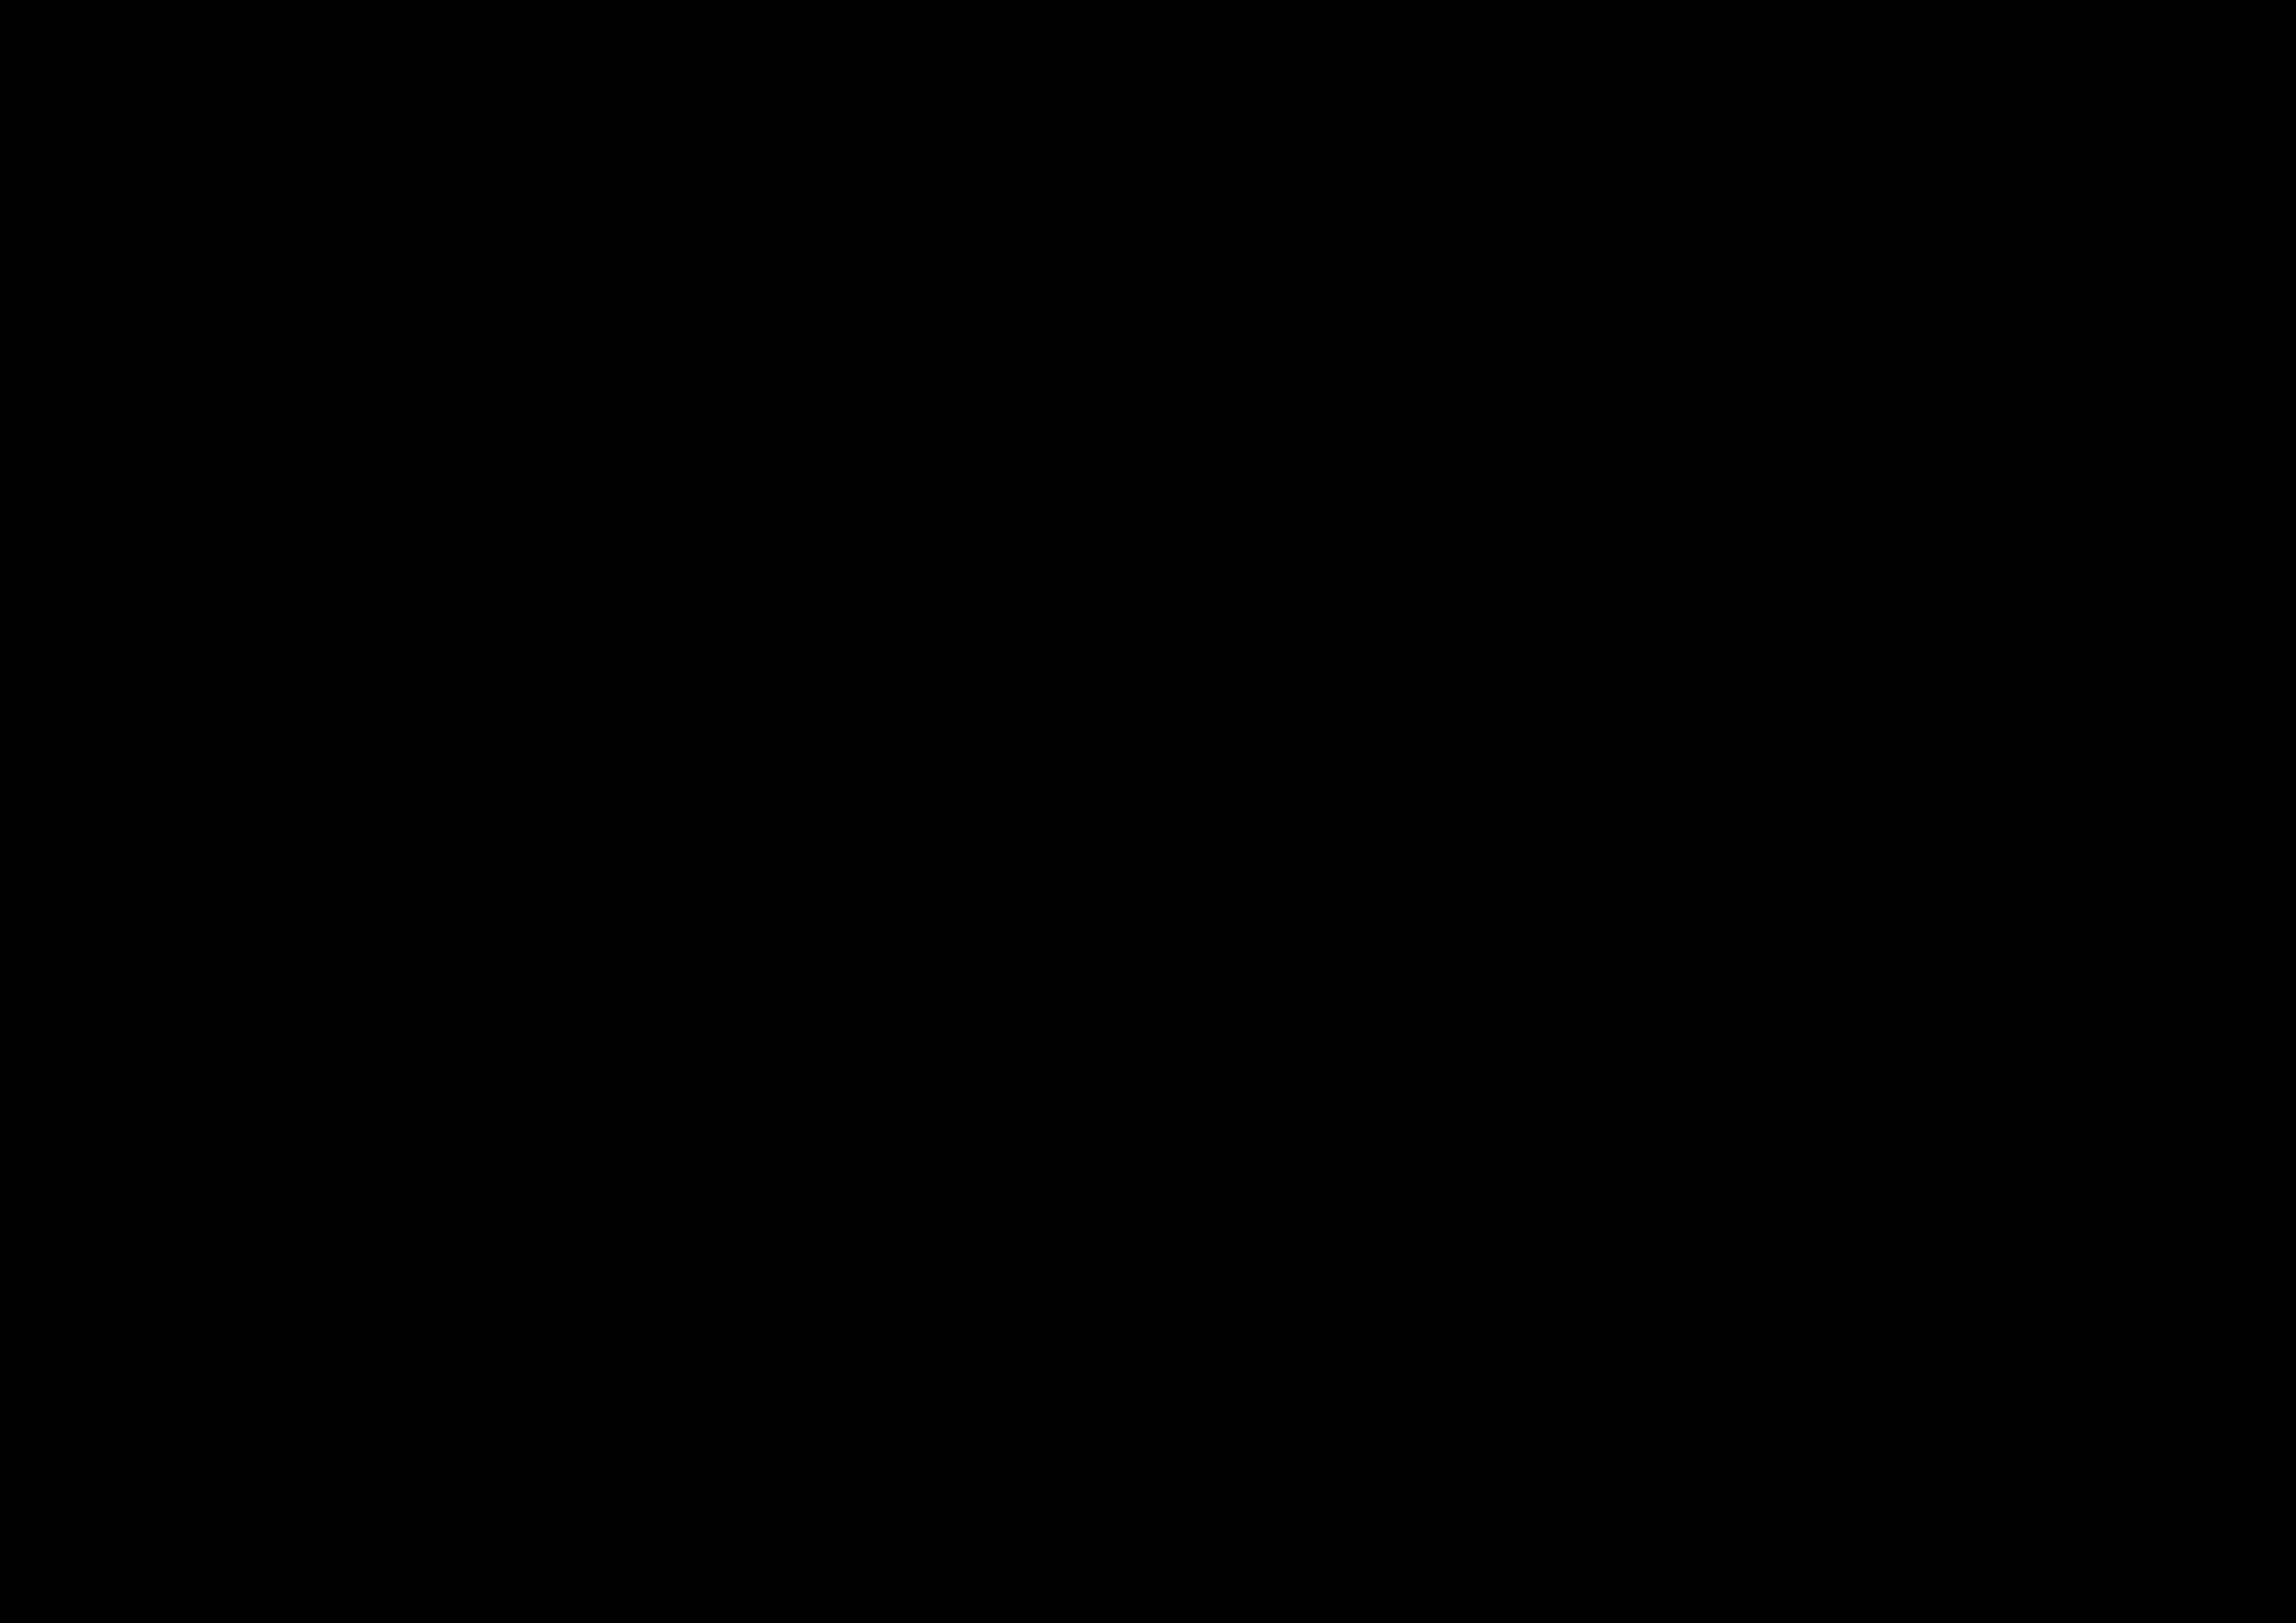 maquetacion-estrategia-ecv-1